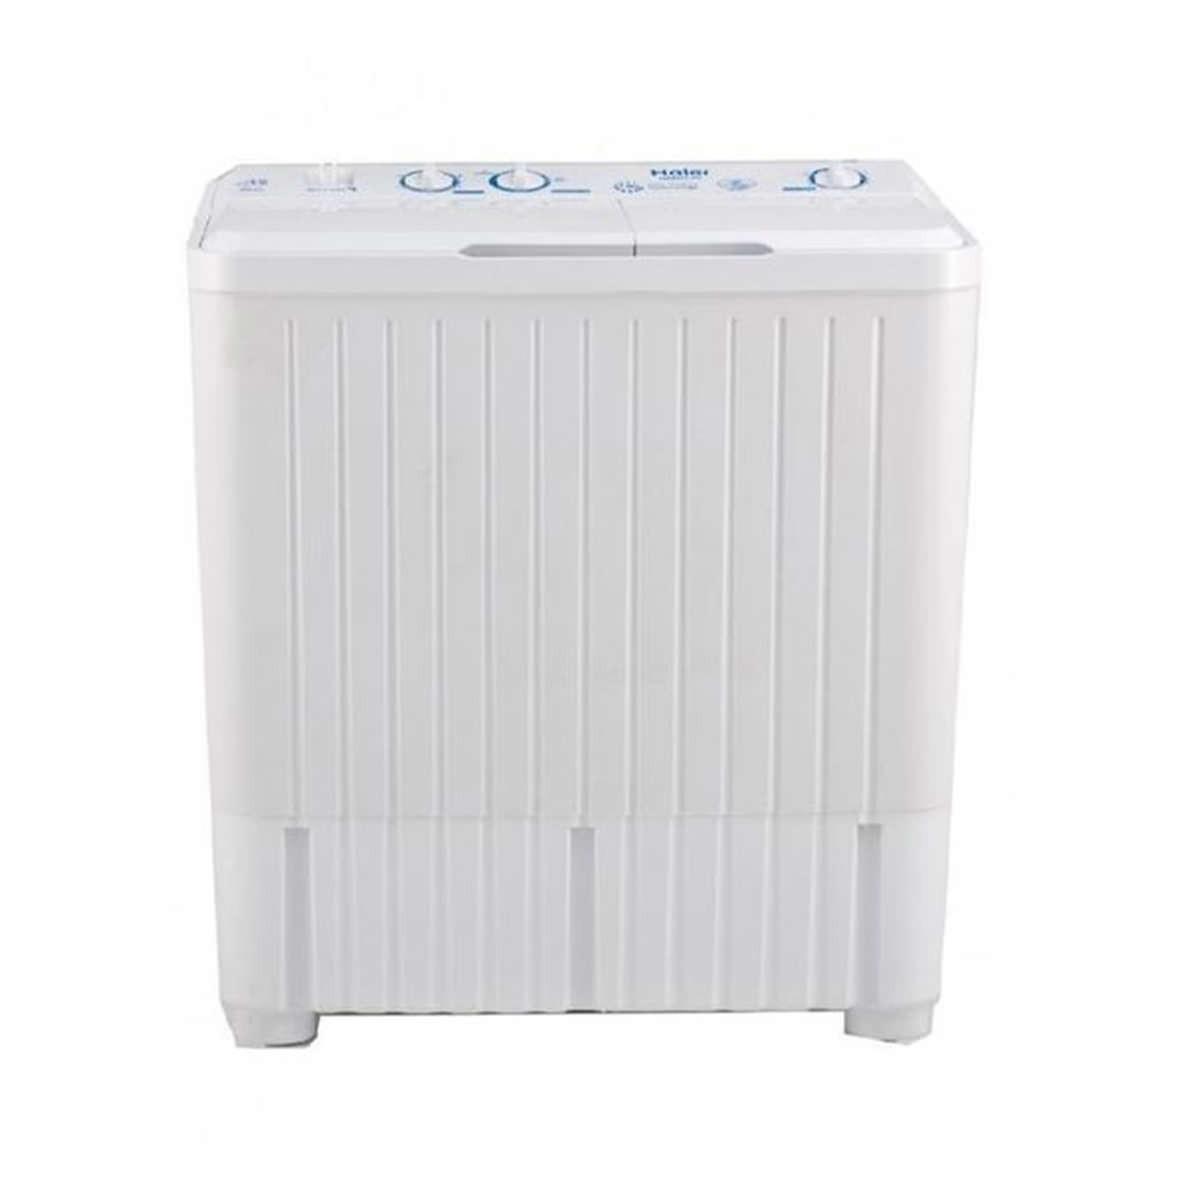 Haier Semi-Automatic Washing Machine HWM 100AS